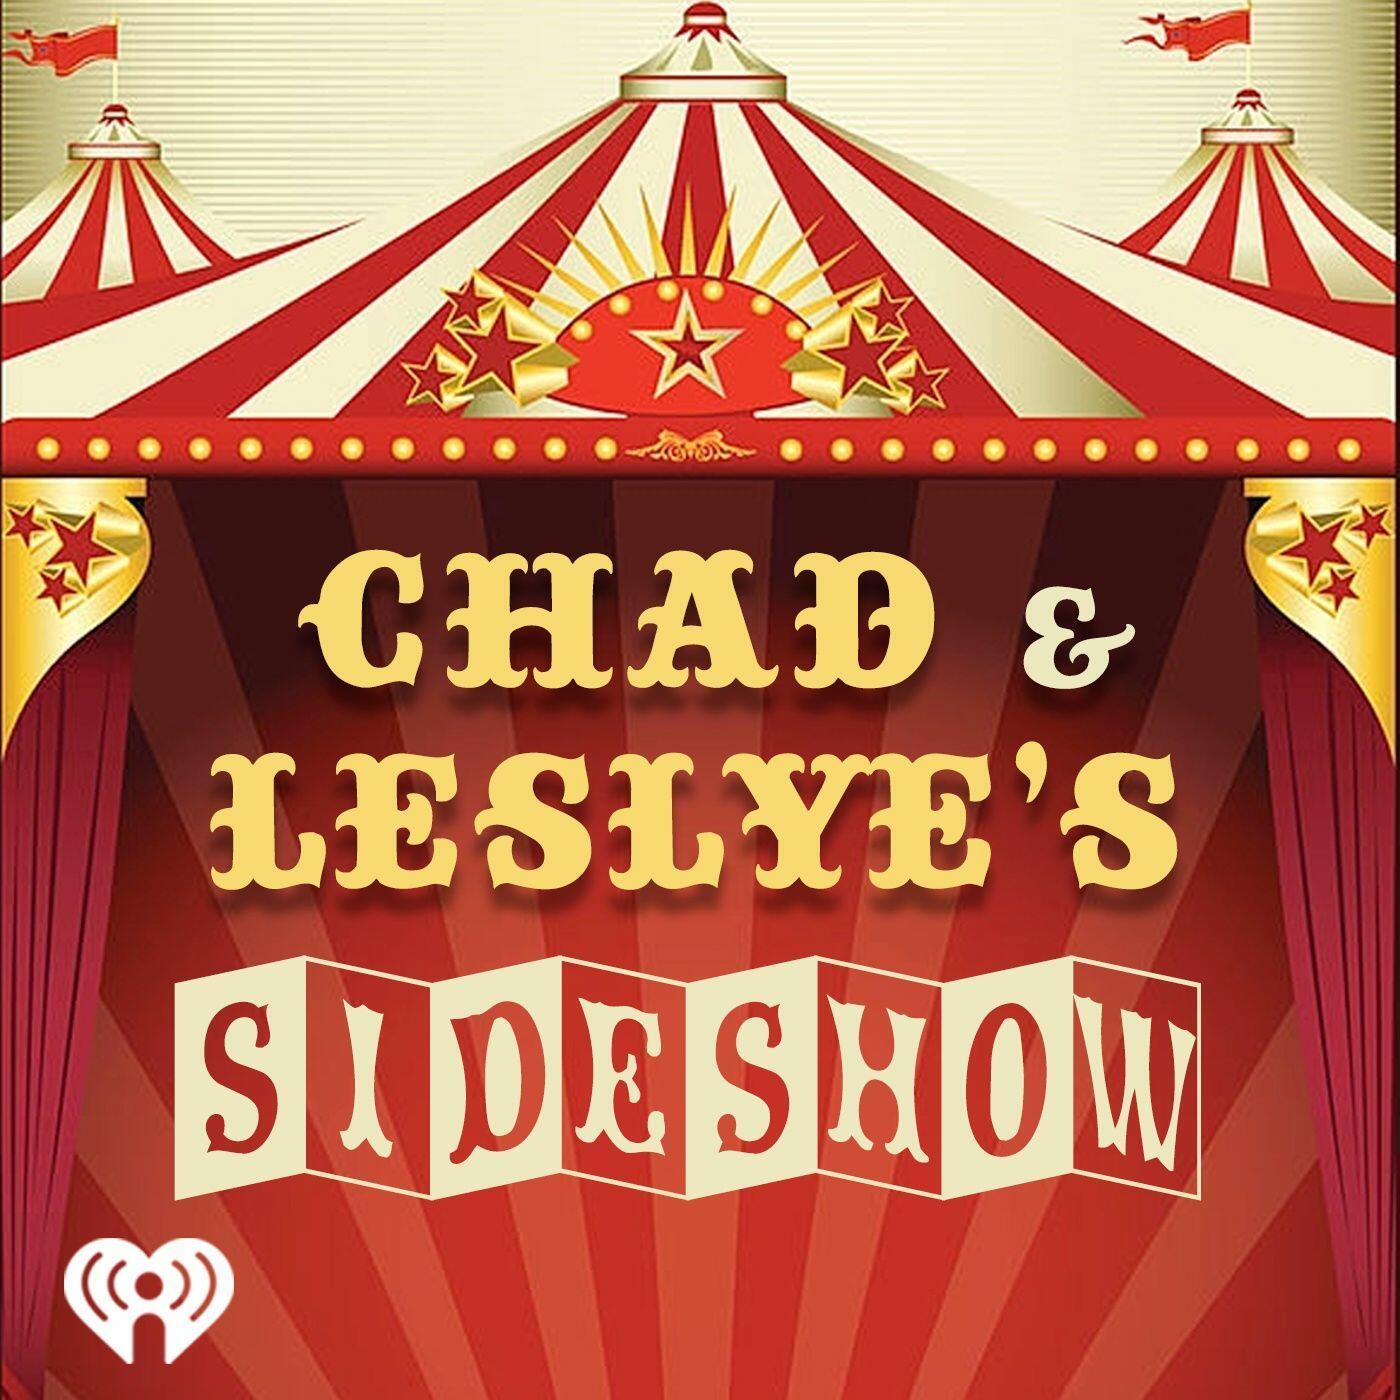 Chad & Leslye's Sideshow